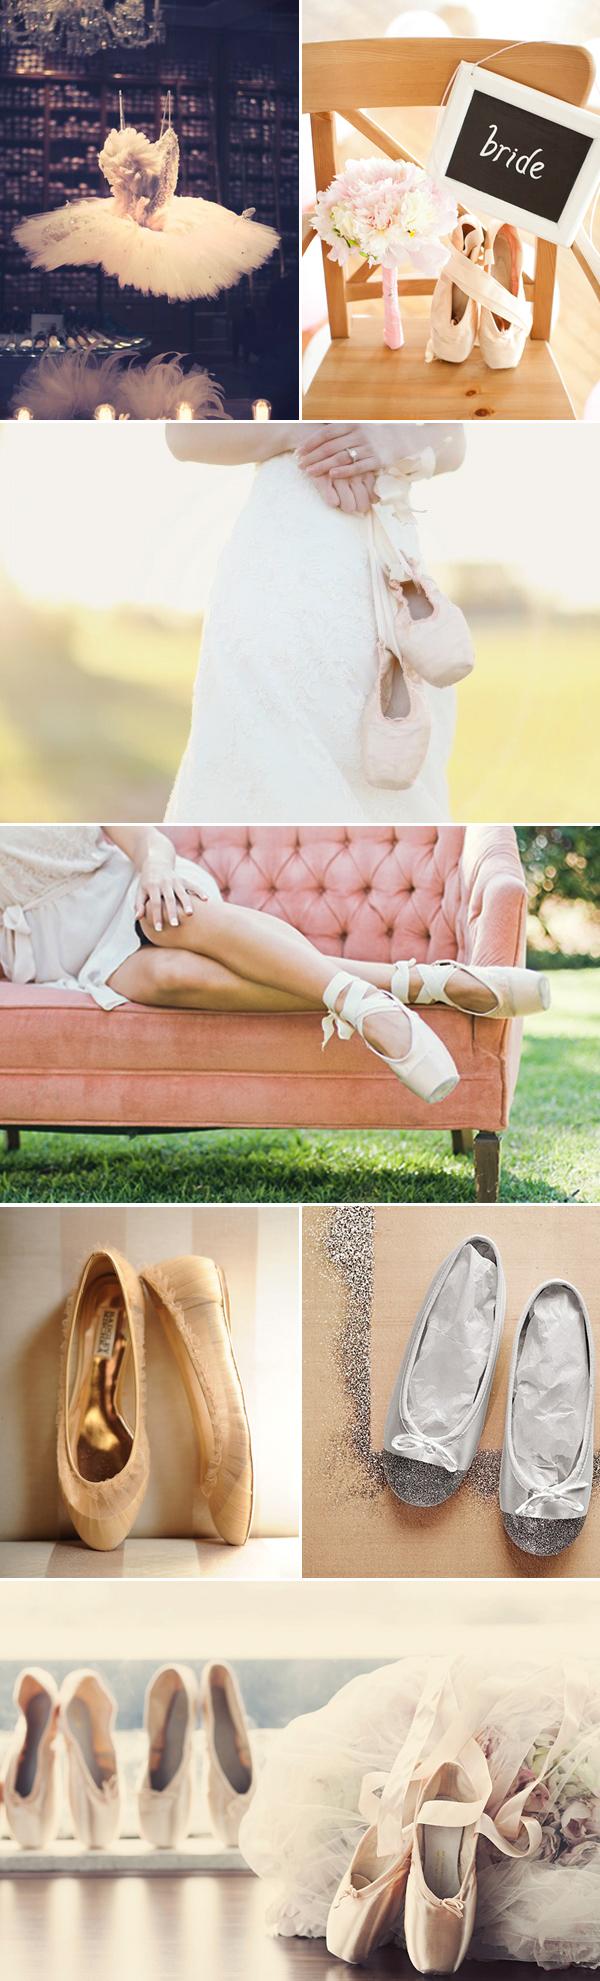 ballerina03-details